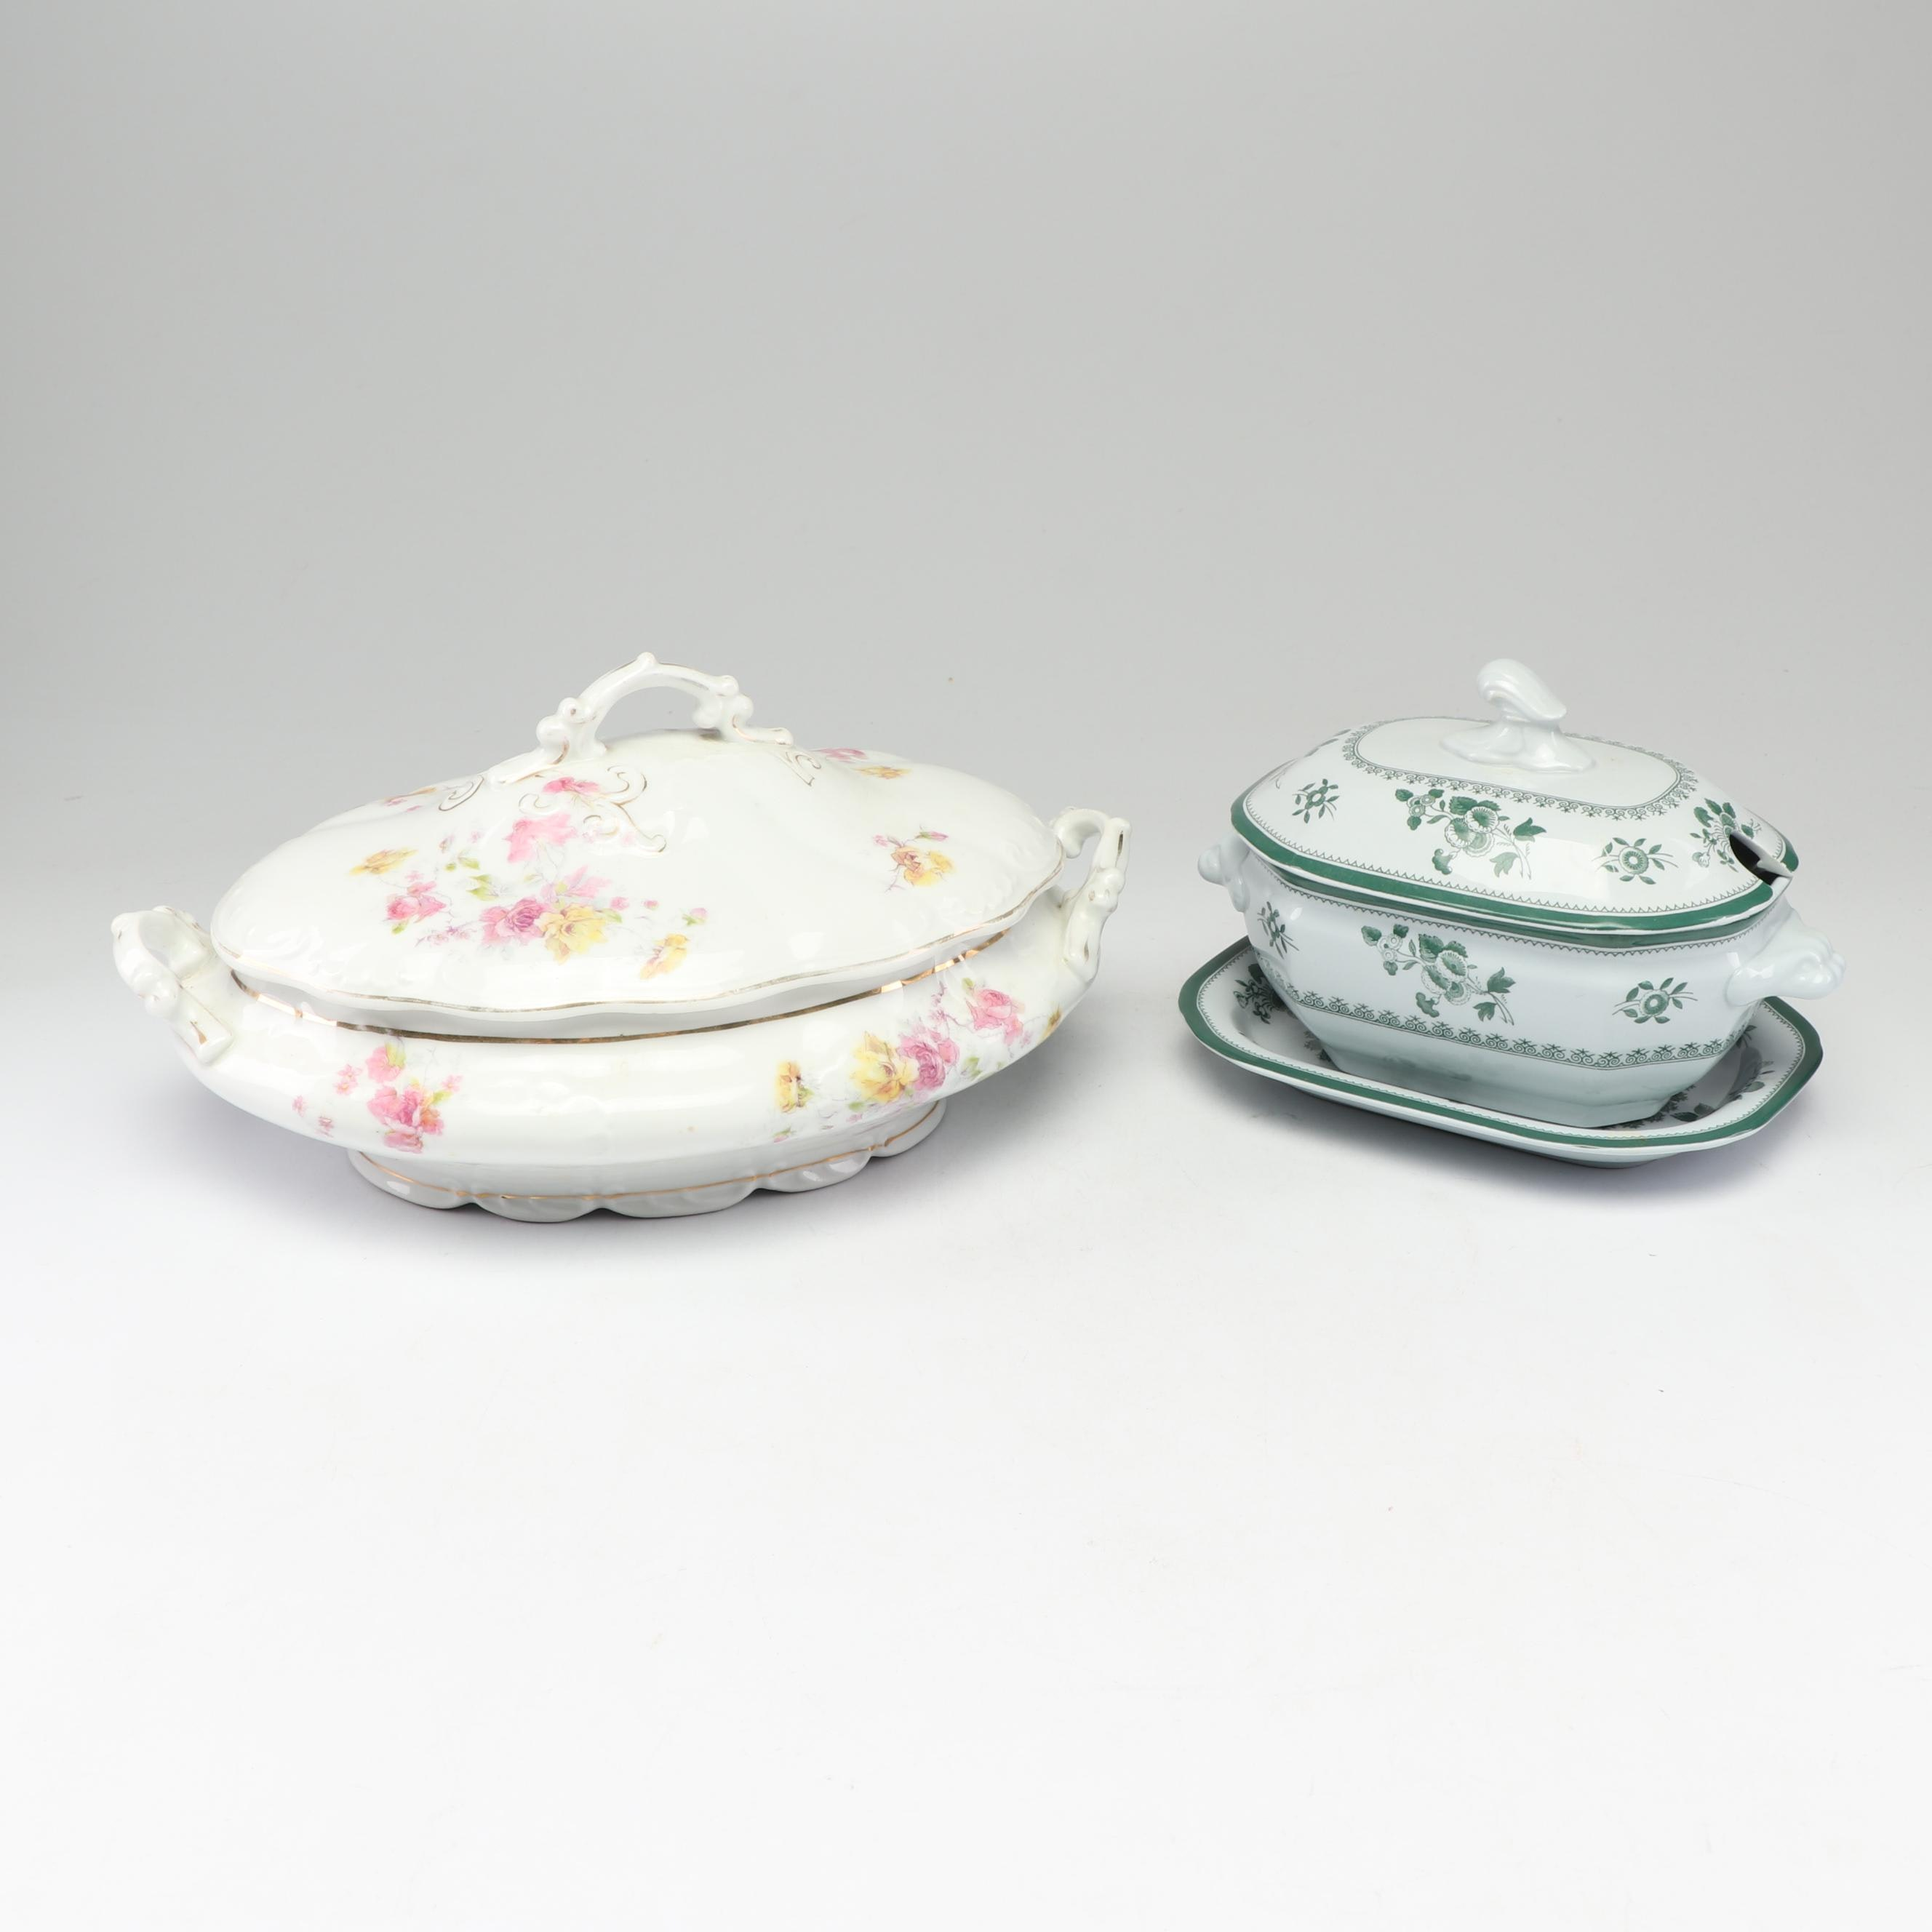 LS&S Carlsbad Porcelain Tureen and Spode Gravy Boat